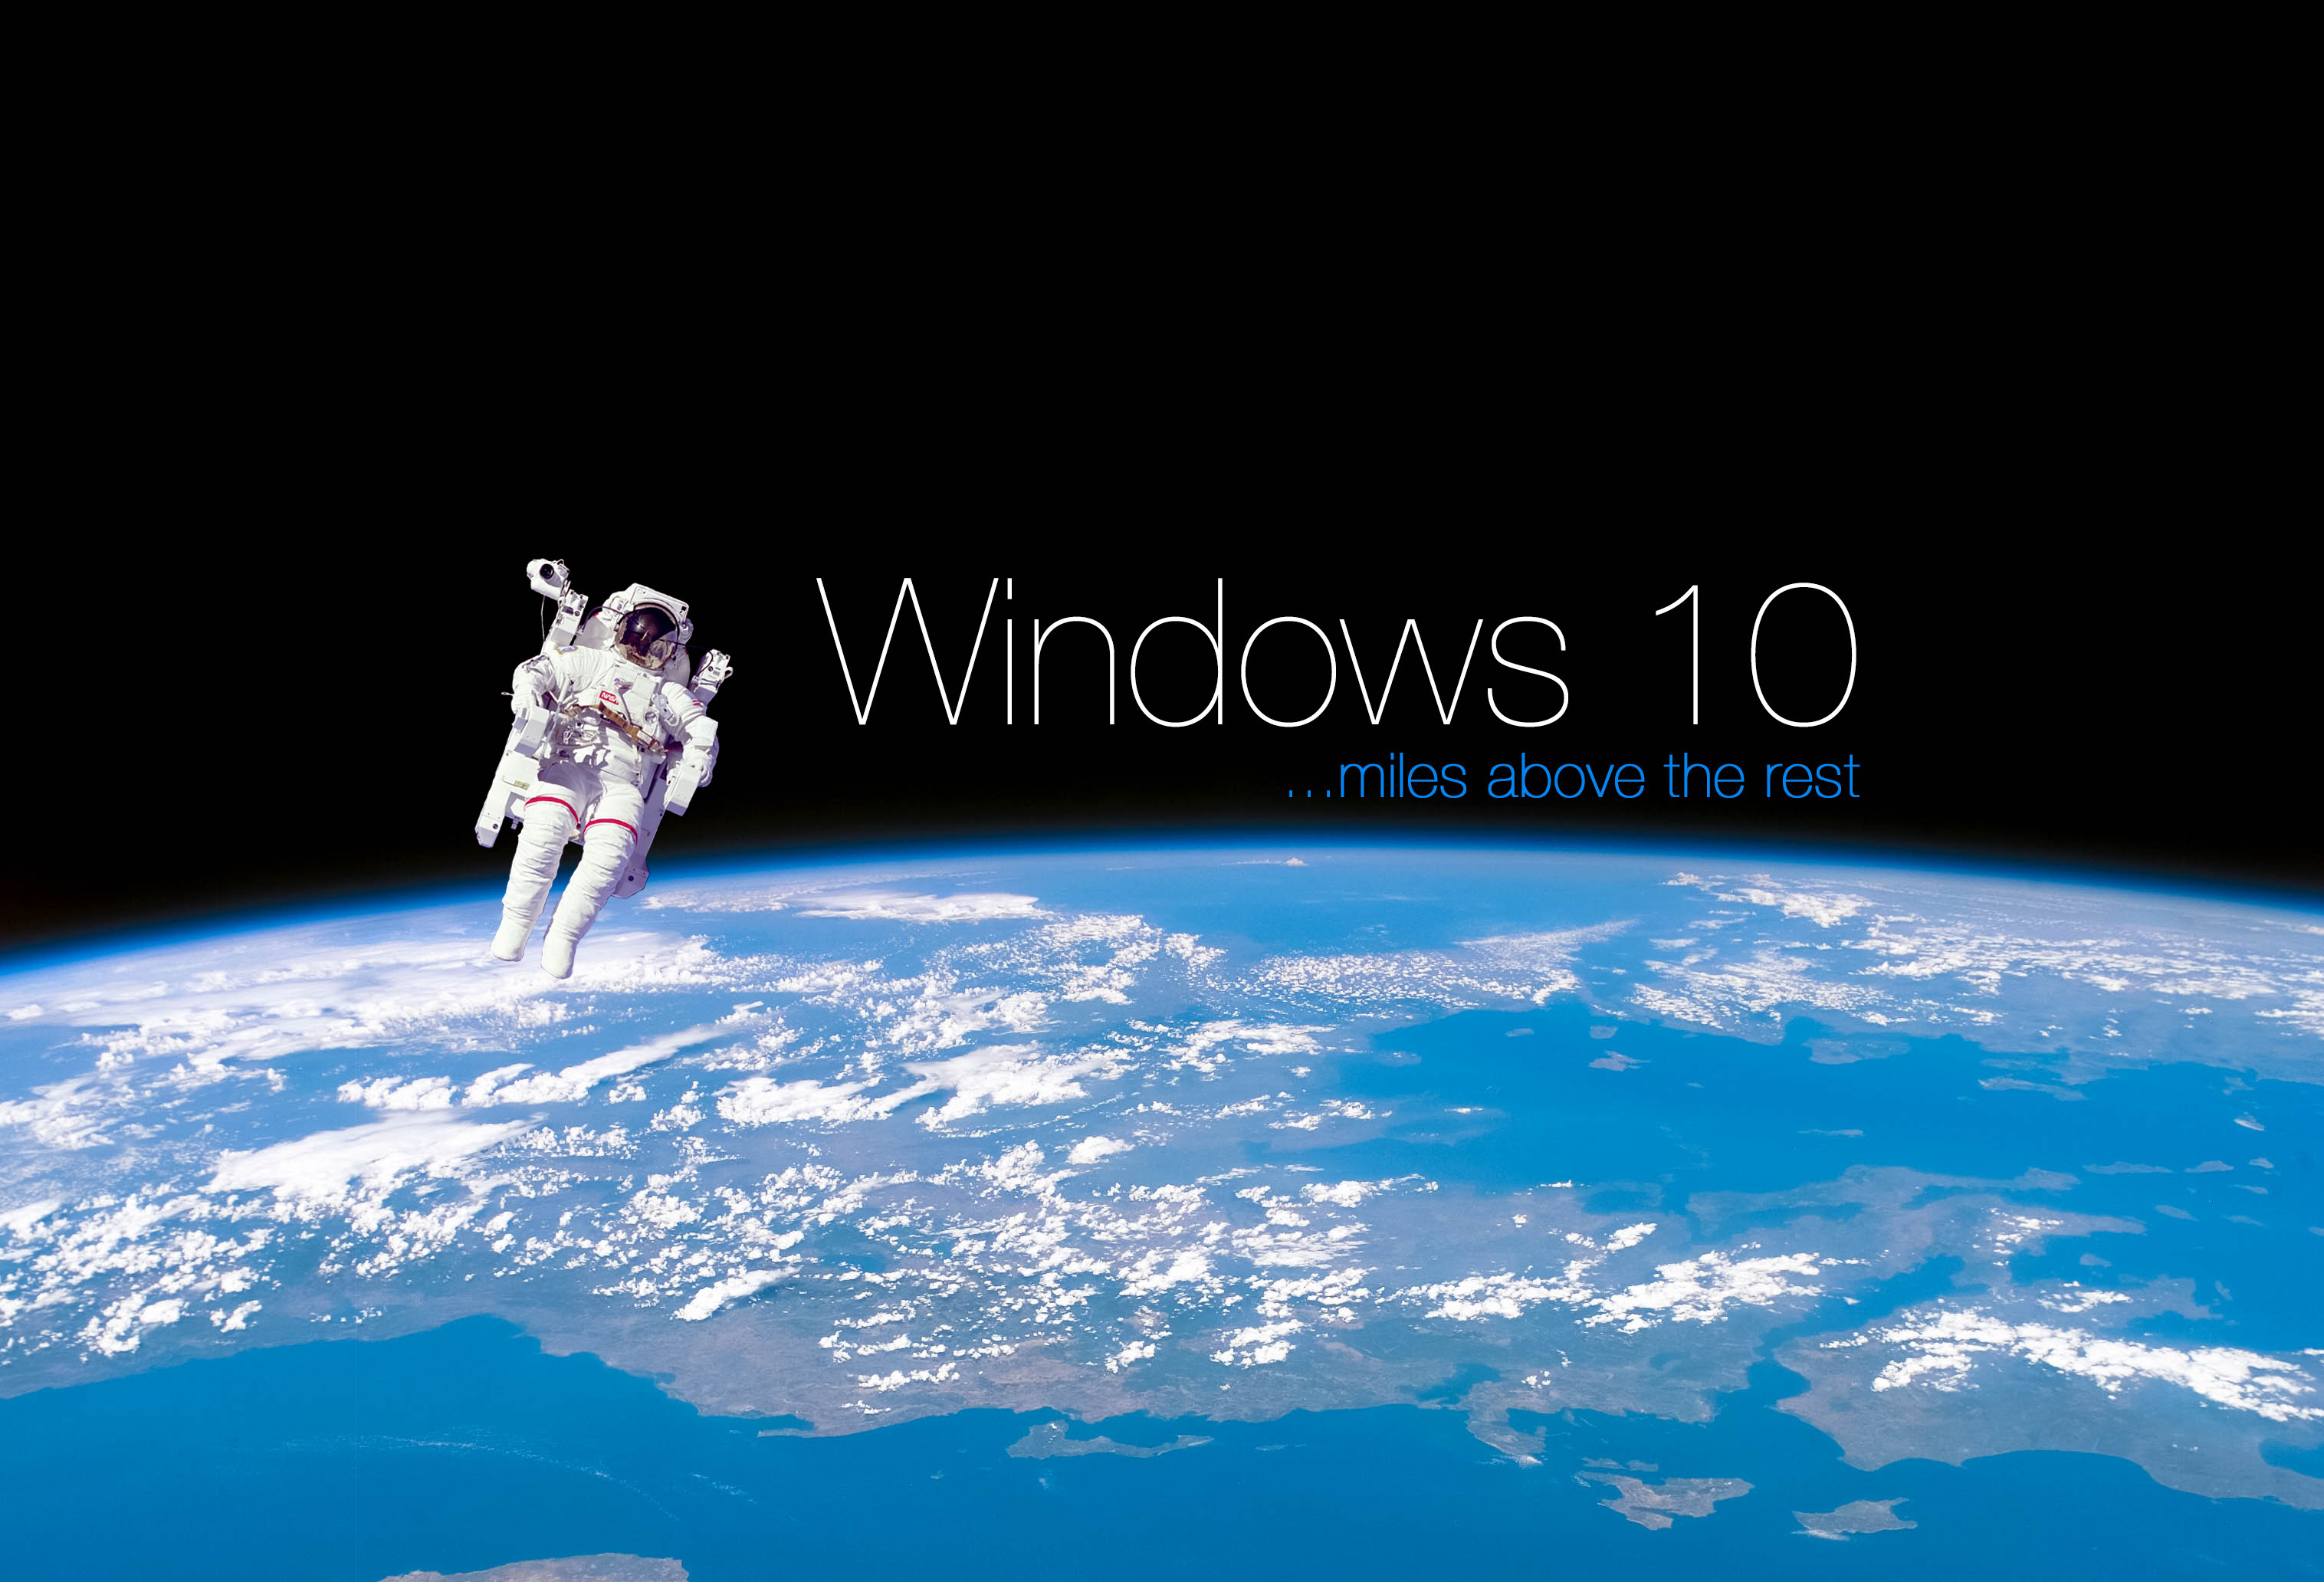 Windows 10 Wallpaper hd Windows 10 Wallpapers HTML code …